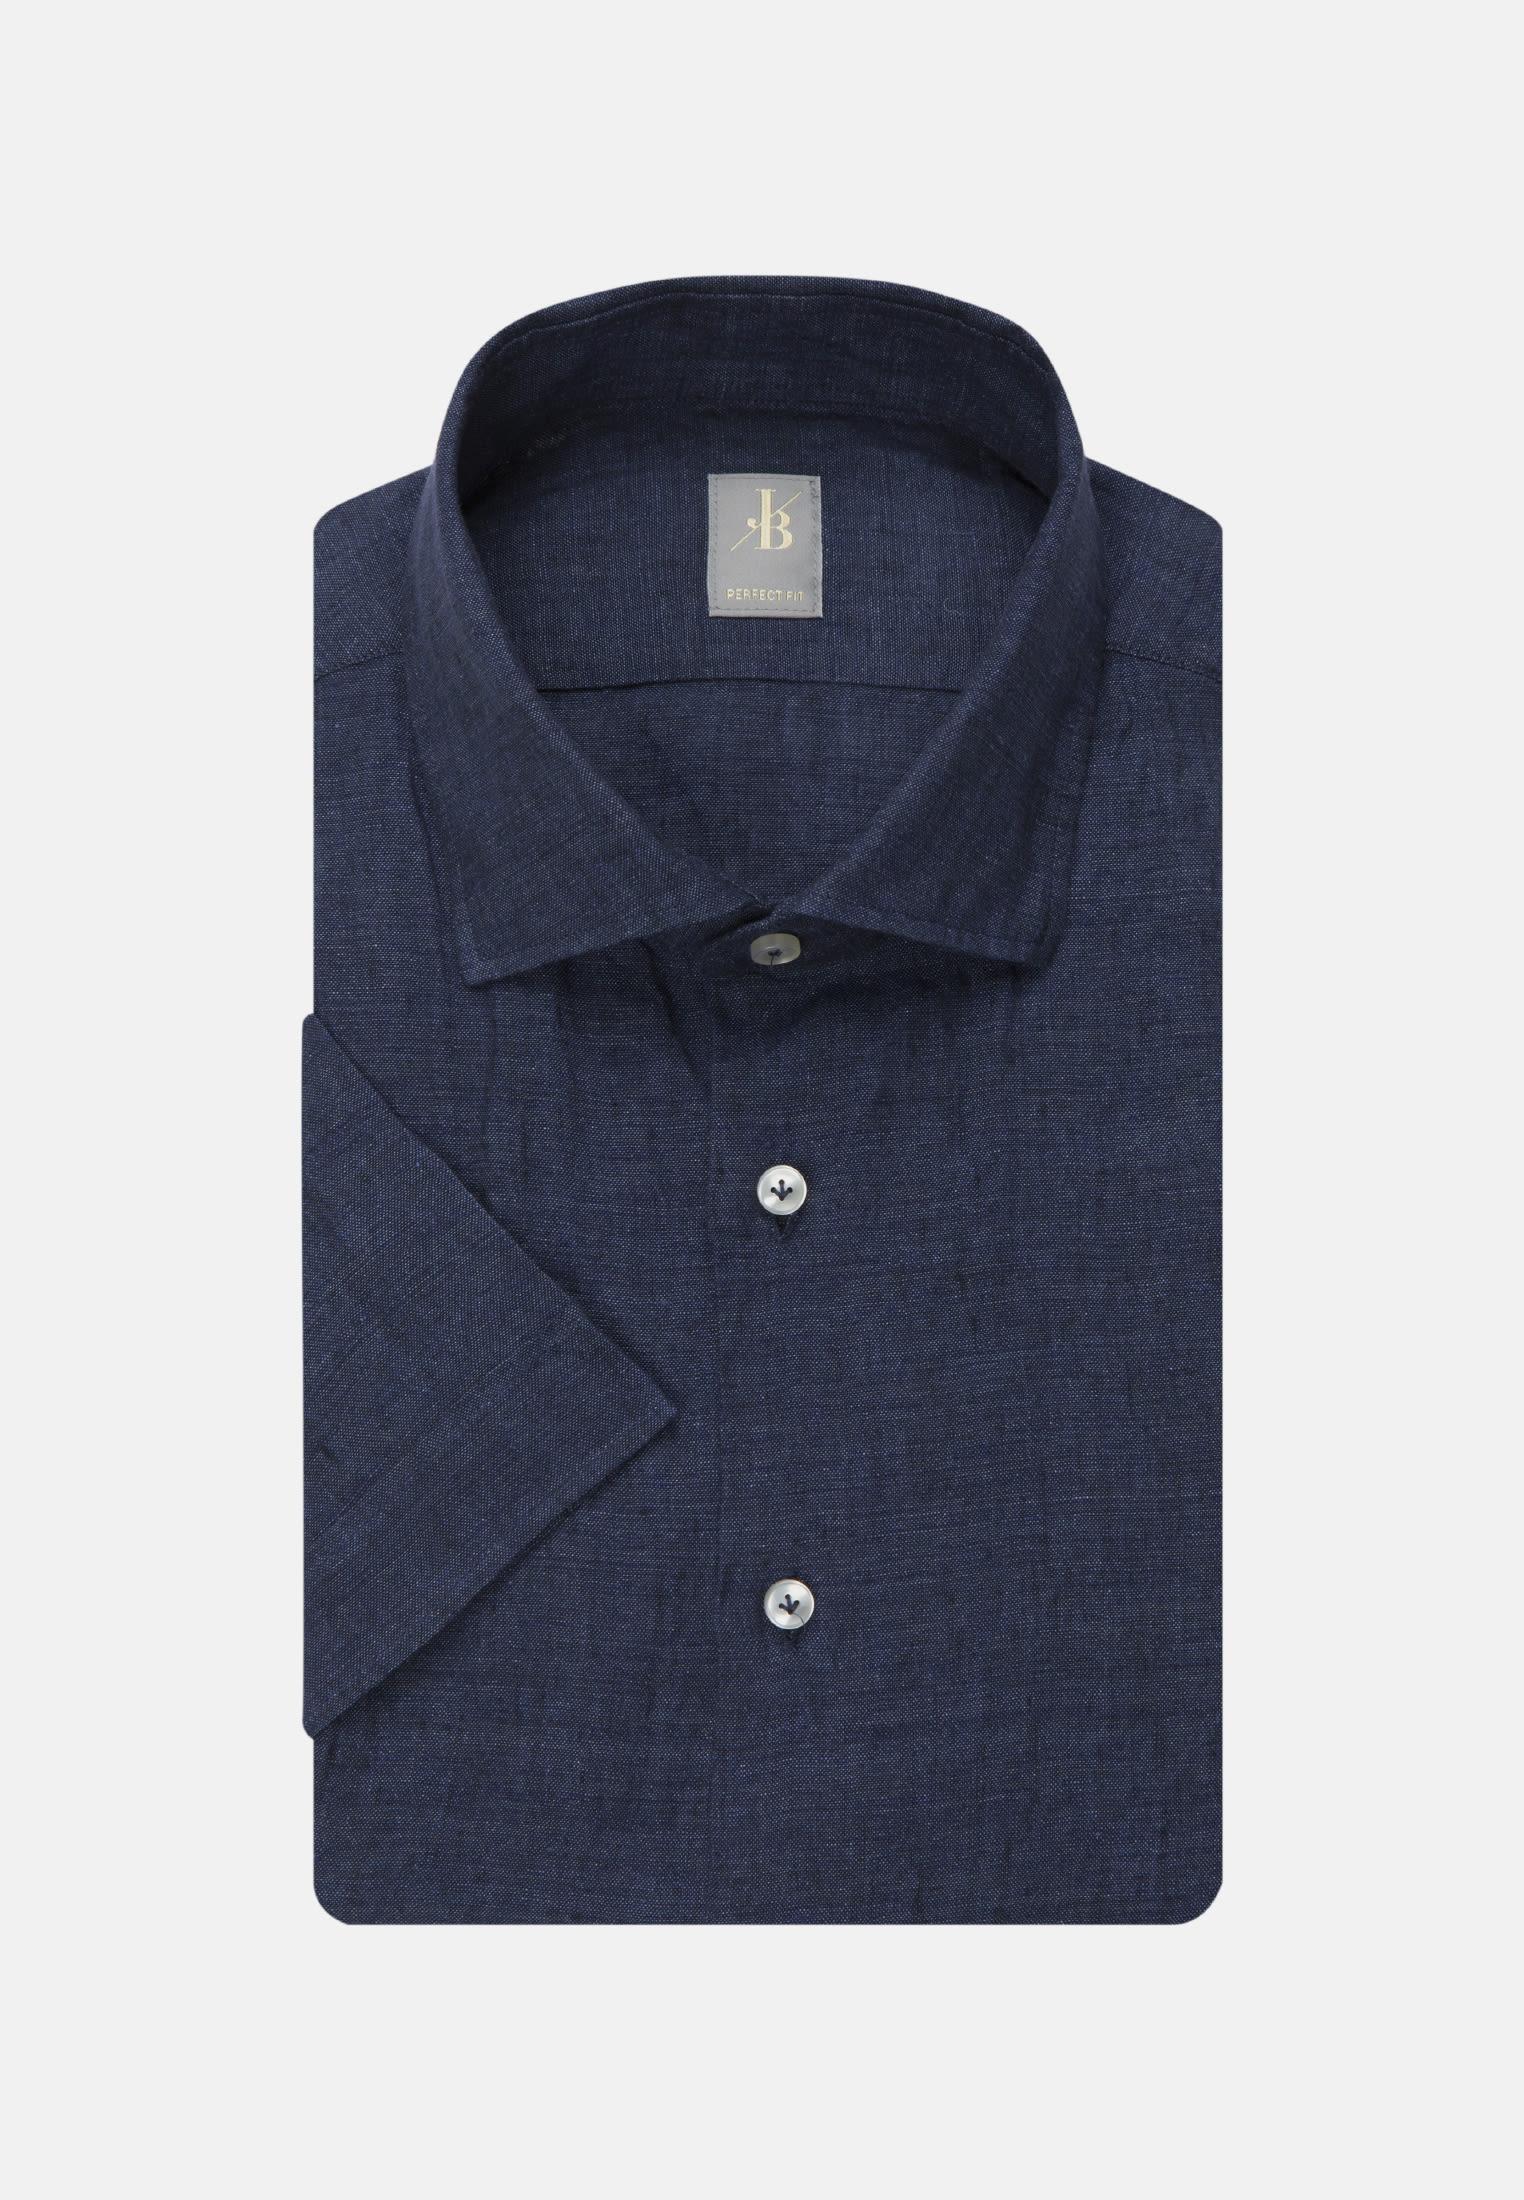 Leinen Smart Casual Hemd in Perfect Fit mit Kentkragen in Dunkelblau    Jacques Britt Onlineshop